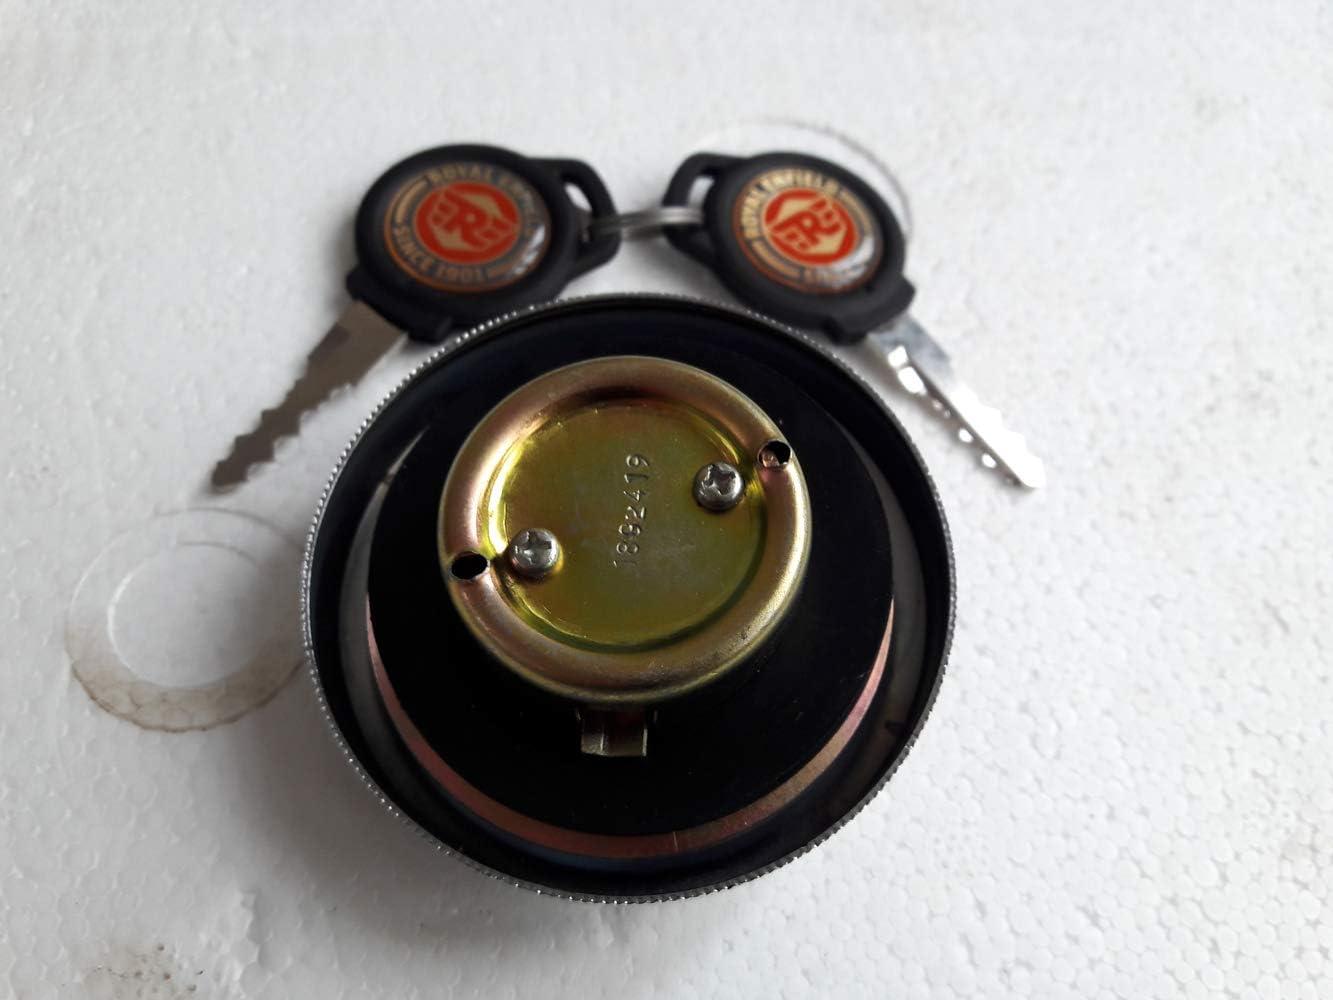 ROYAL ENFIELD PETROL FUEL TANK CAP LOCK WITH KEYS SET # 597128